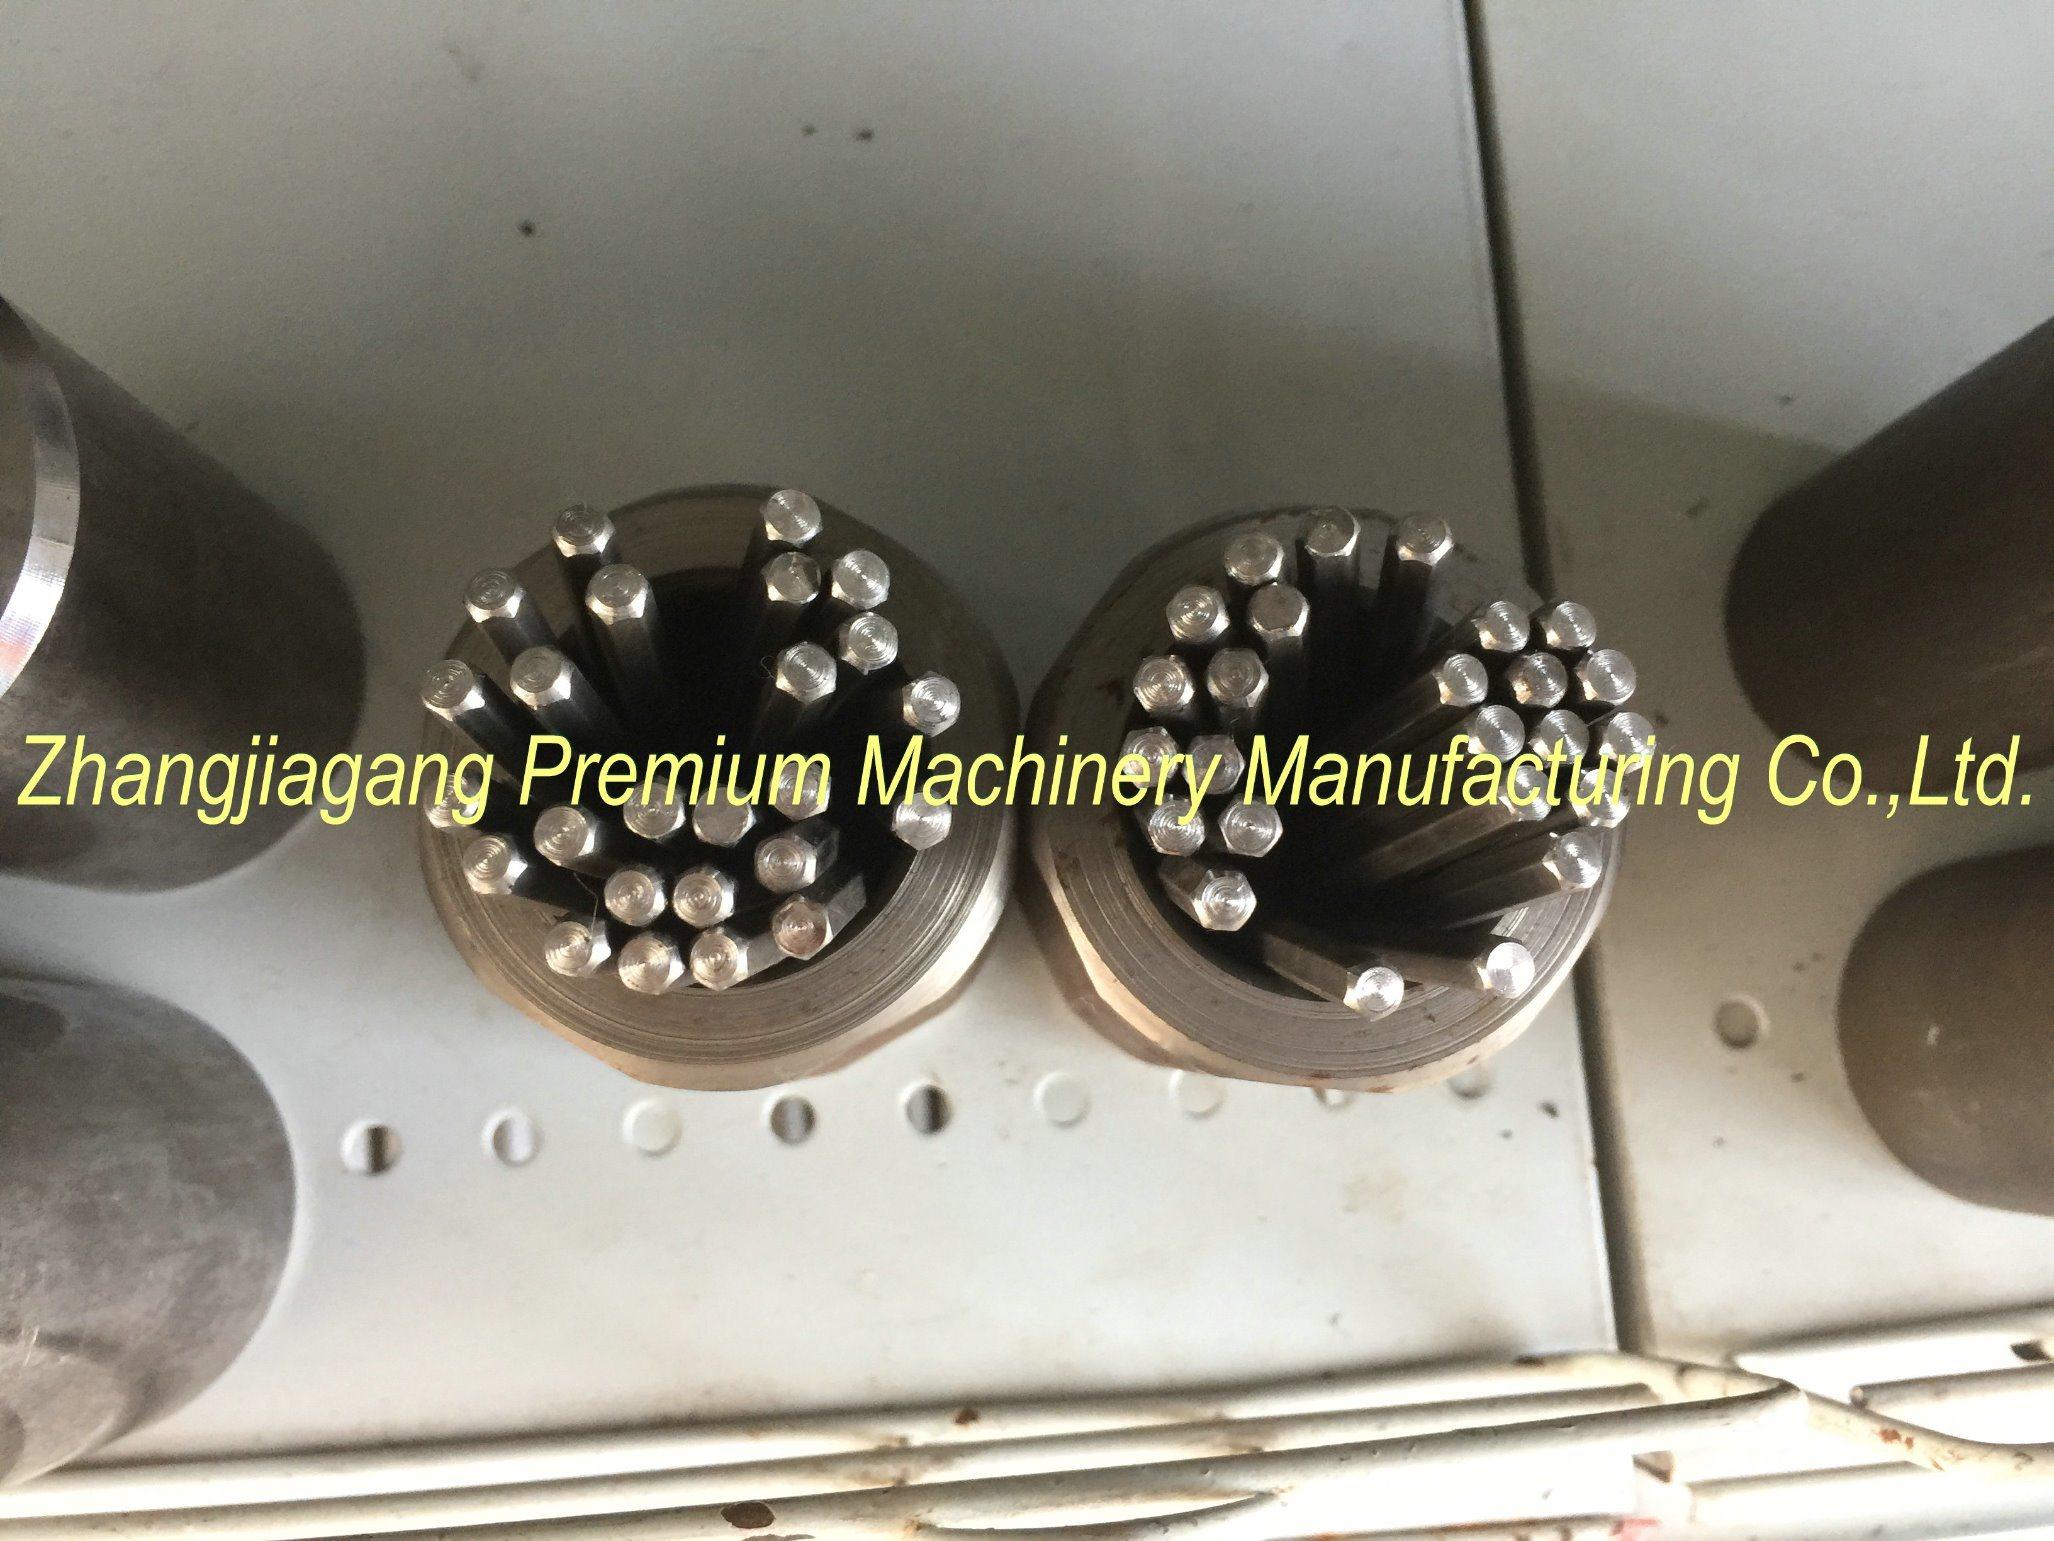 Mini Machine Plm-Fa40 Double Head Pipe Chamfering Machine